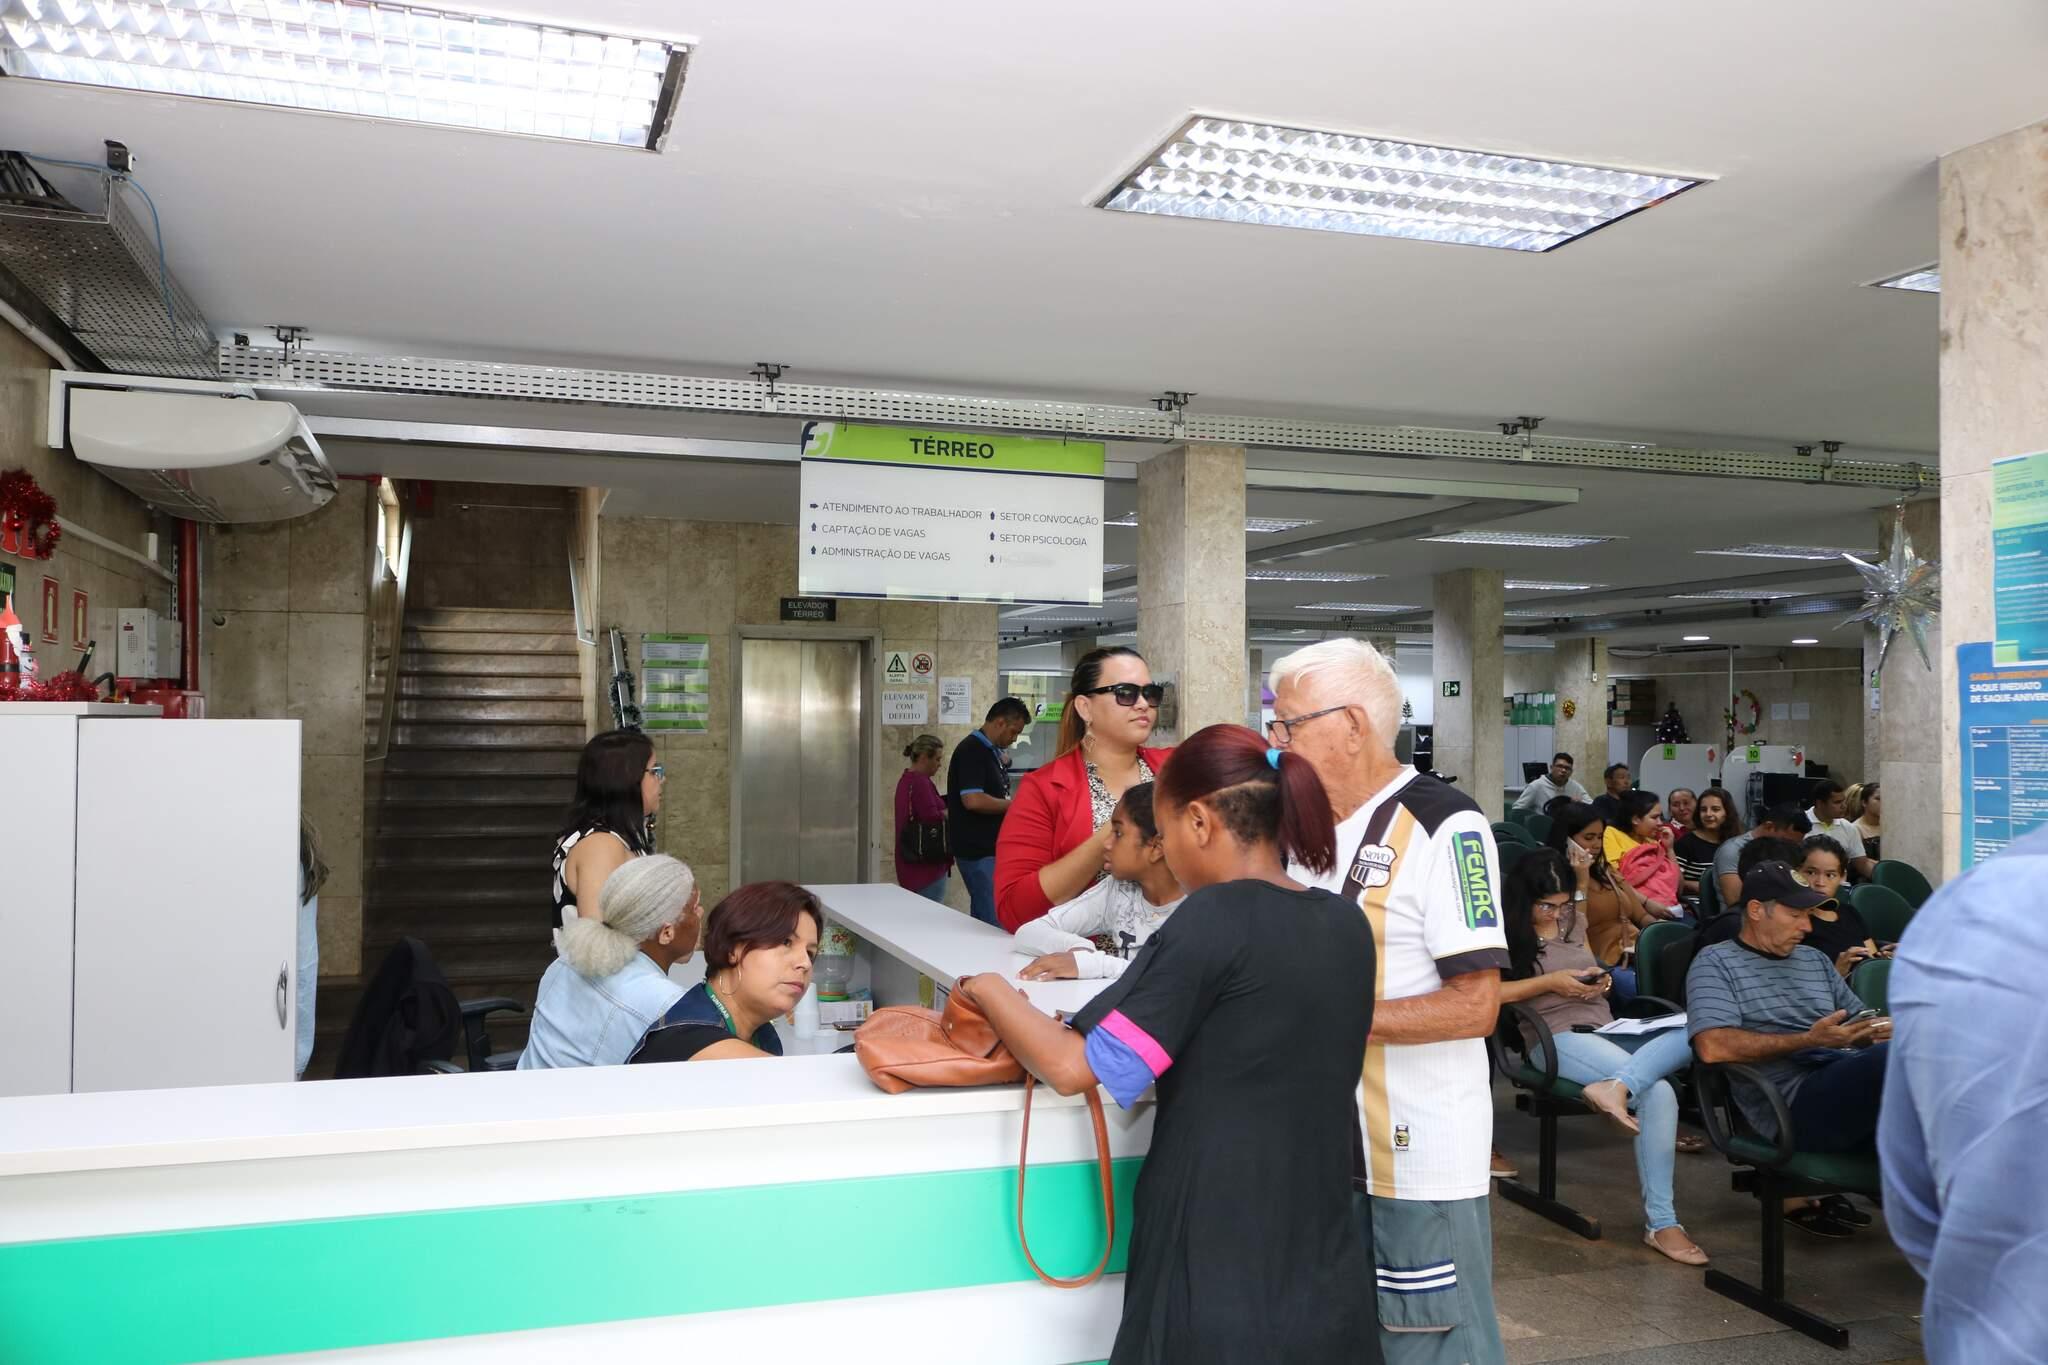 Trabalhadores aguardando atendimento na Funtrab, antes da pandemia. (Foto: Marcos Maluf/Arquivo)